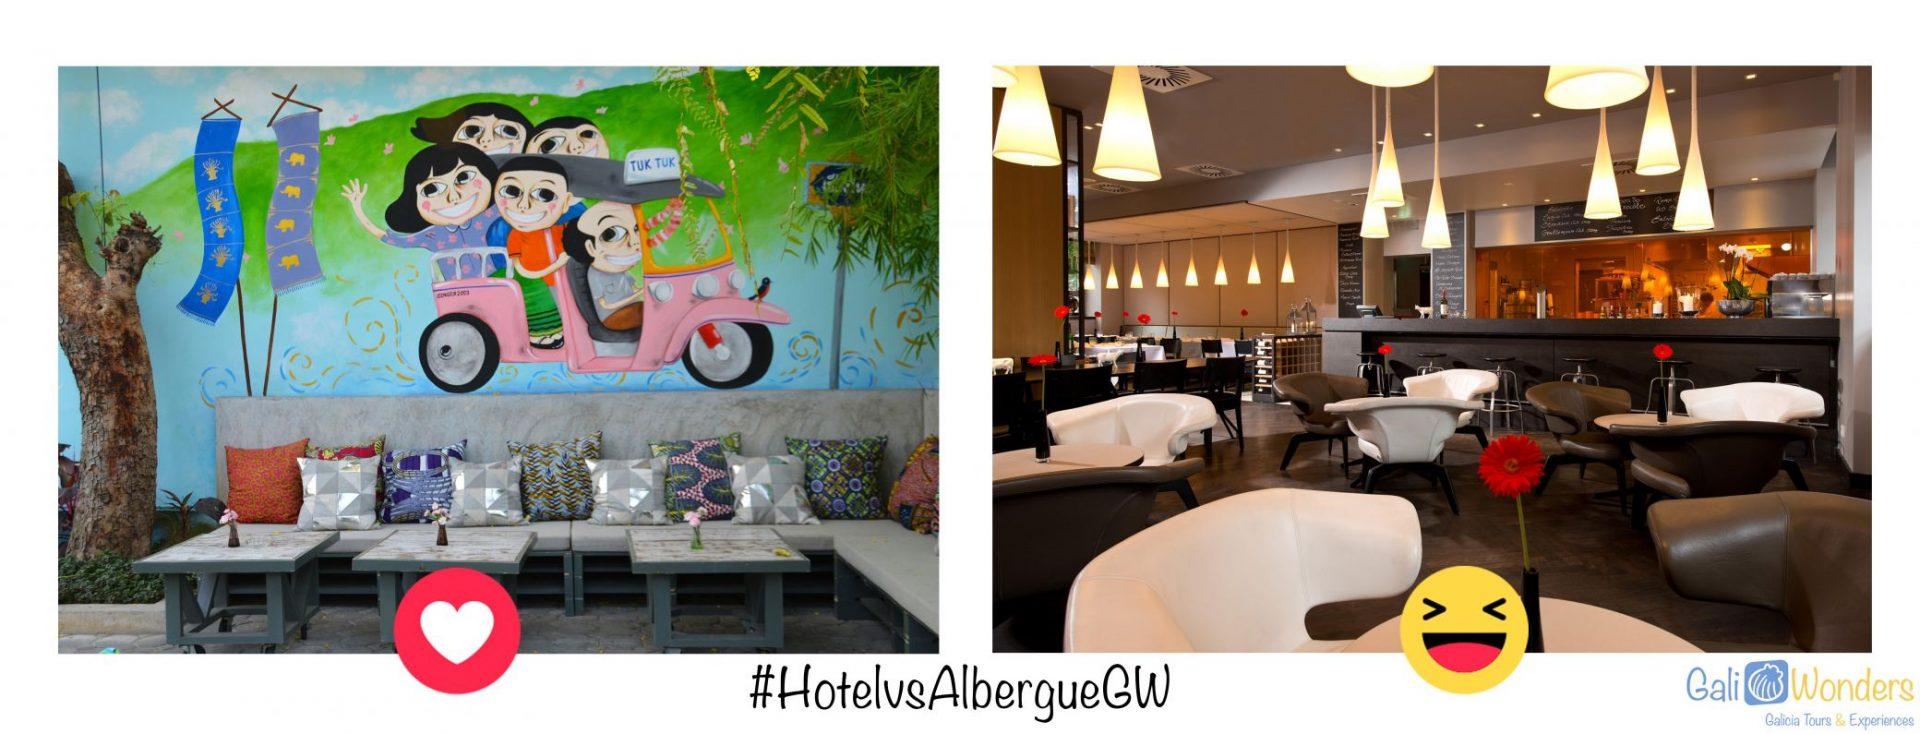 #HotelVSAlbergueGW Galiwonders